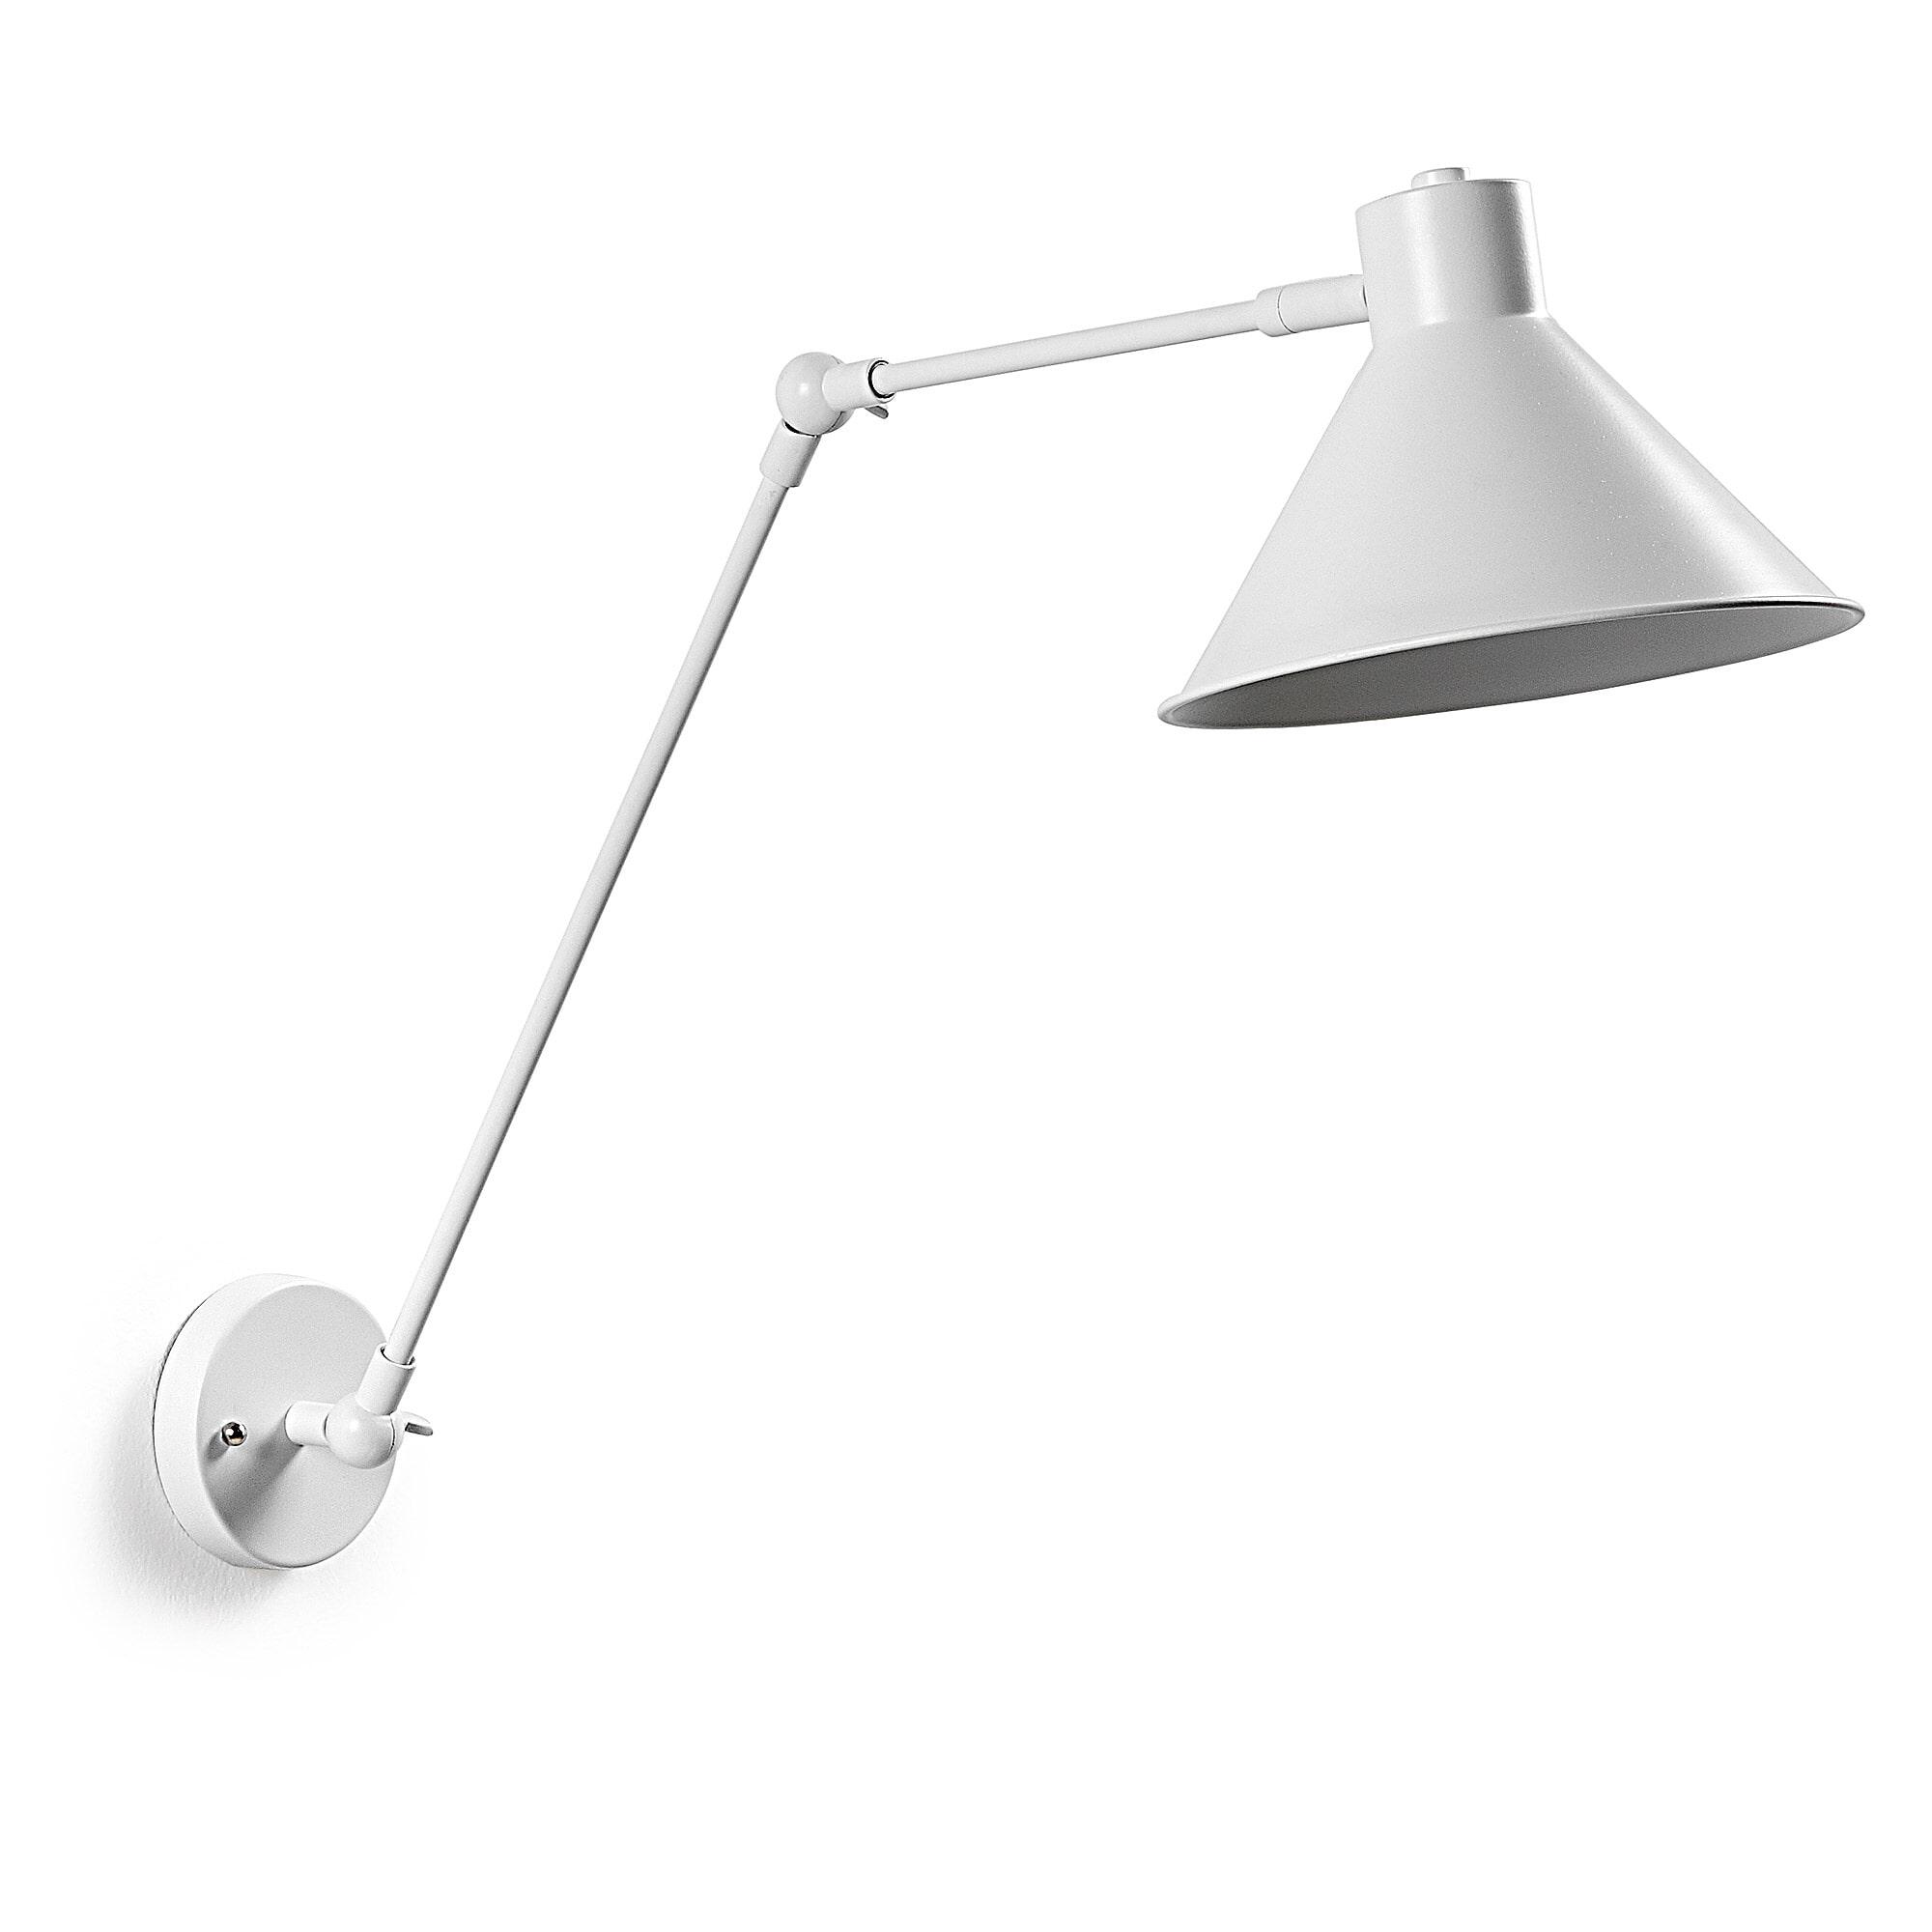 Kave Home wandlamp 'Dione', kleur wit